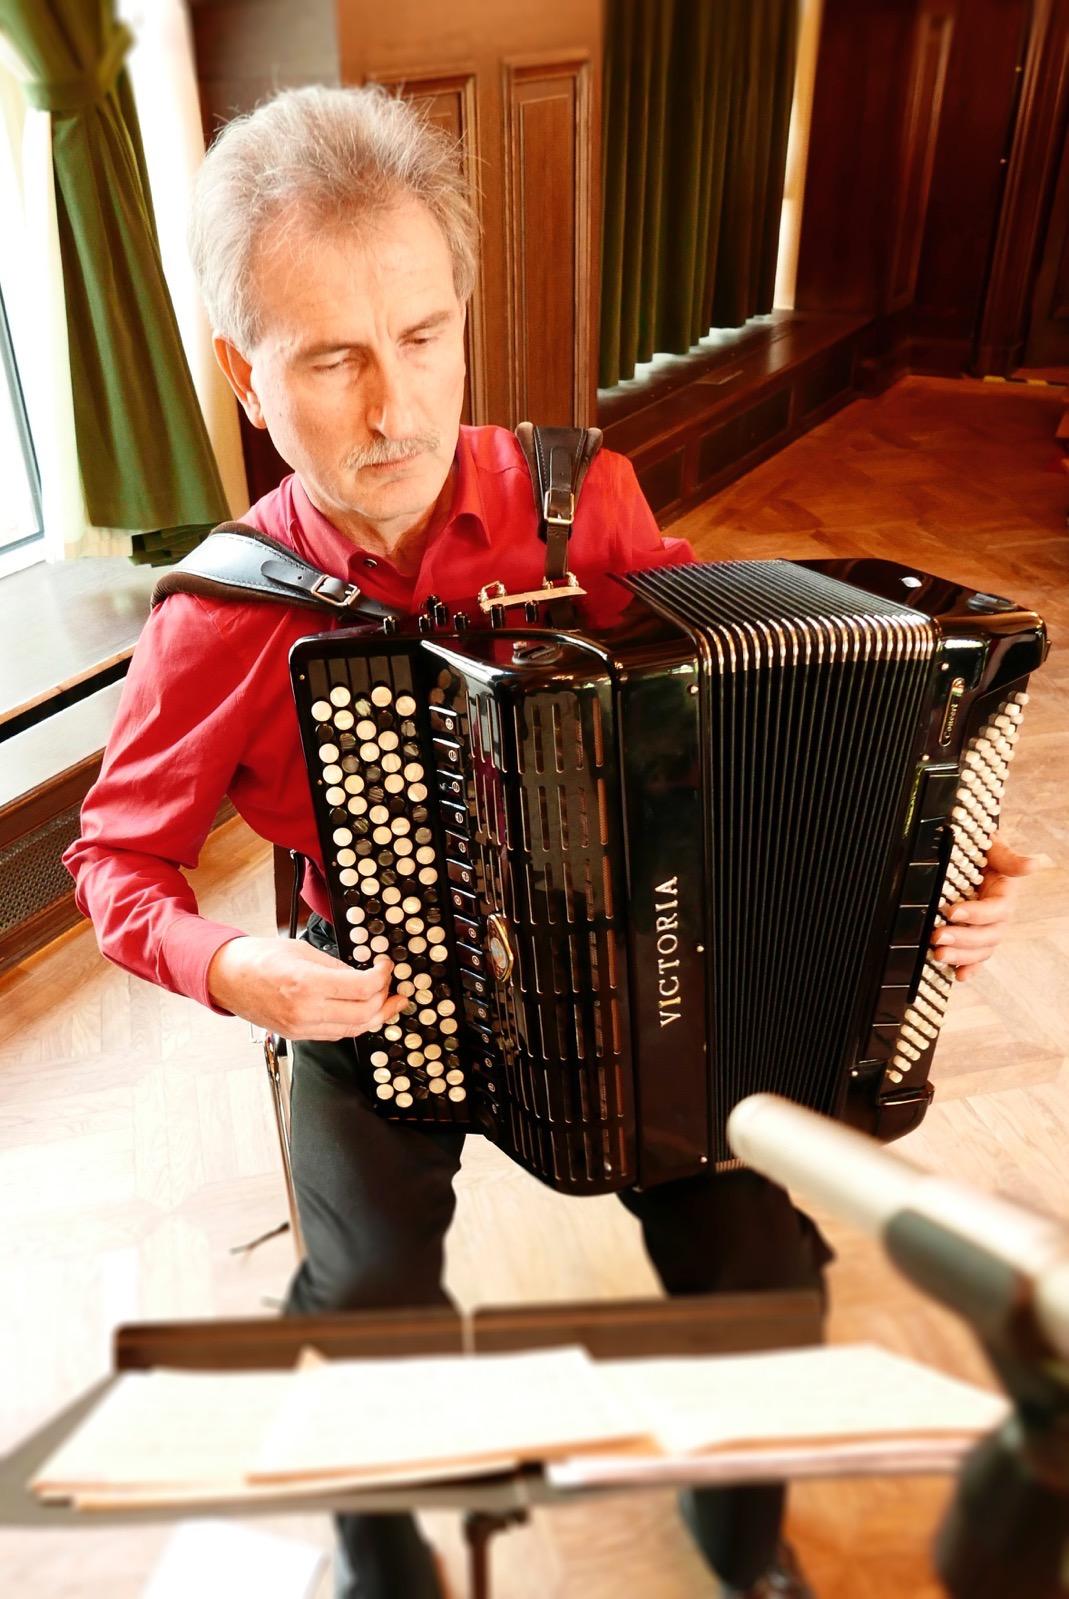 Valeri Funkner, Akkordeonist des ensemble leipziger salon